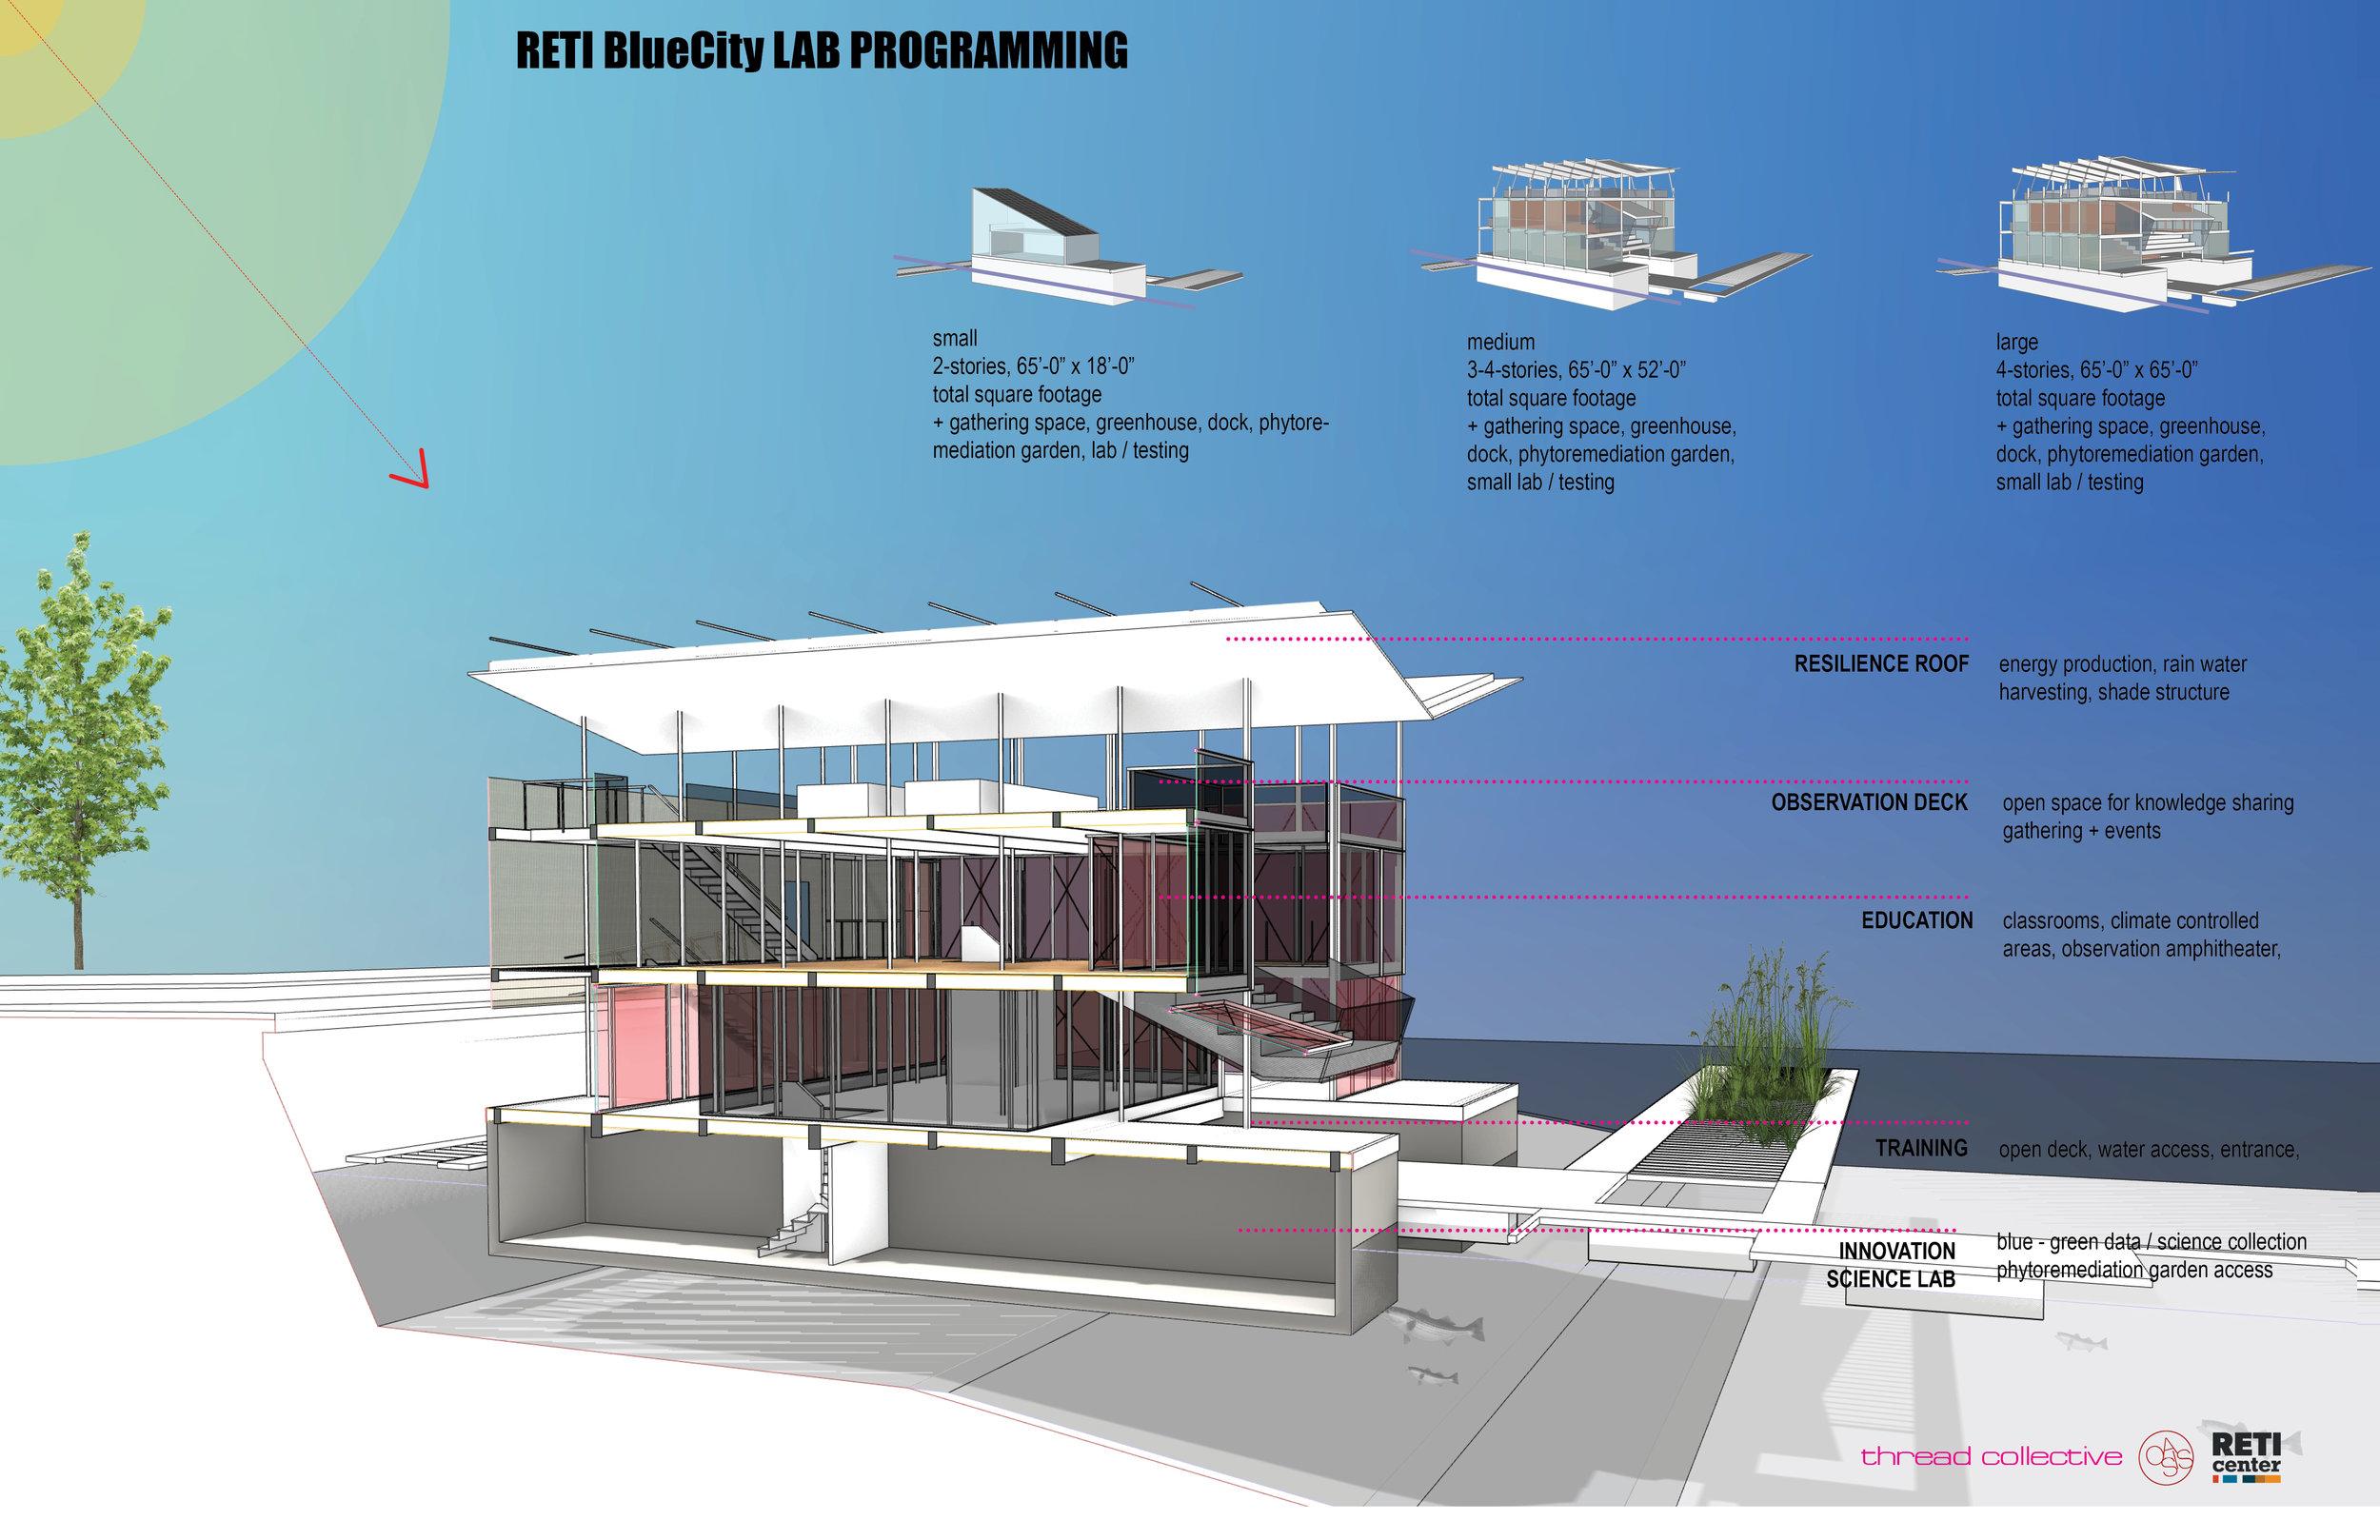 060119 RETI BlueCity LAB design crit presentation7.jpg